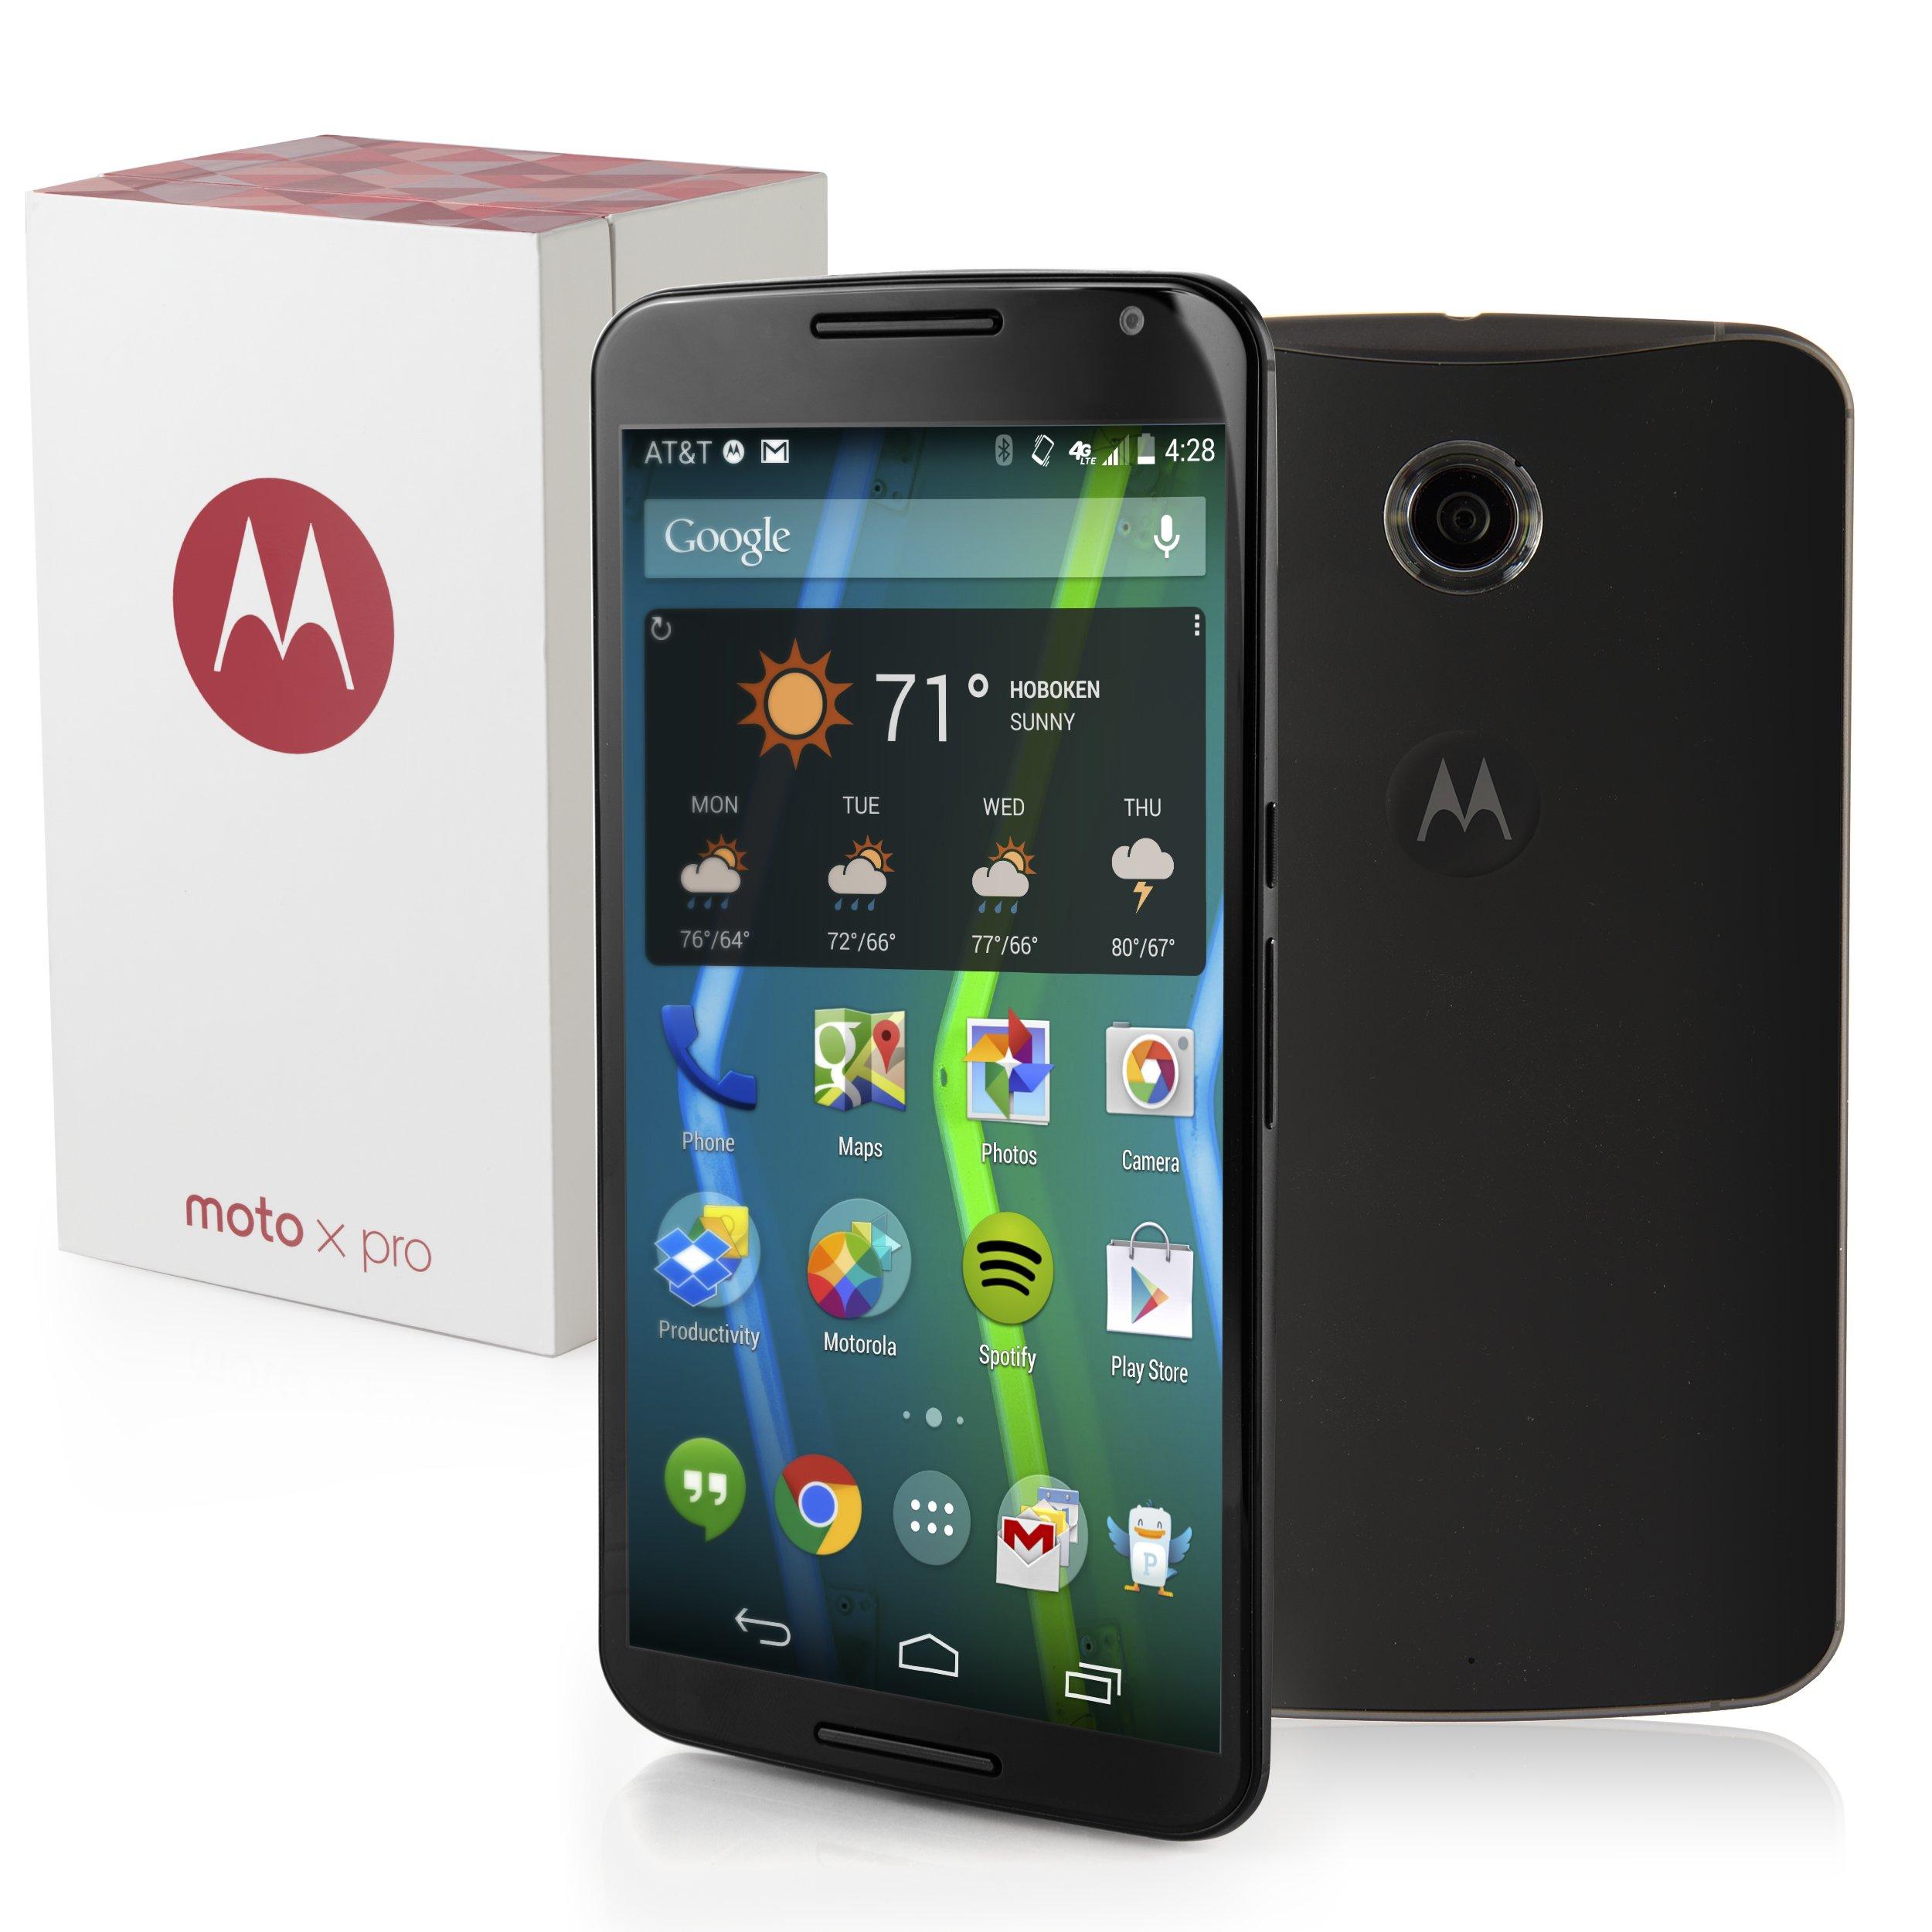 Motorola Moto X Pro 64GB 6.3'' 4G LTE Android Cell Phone GSM Unlocked International Version - Black